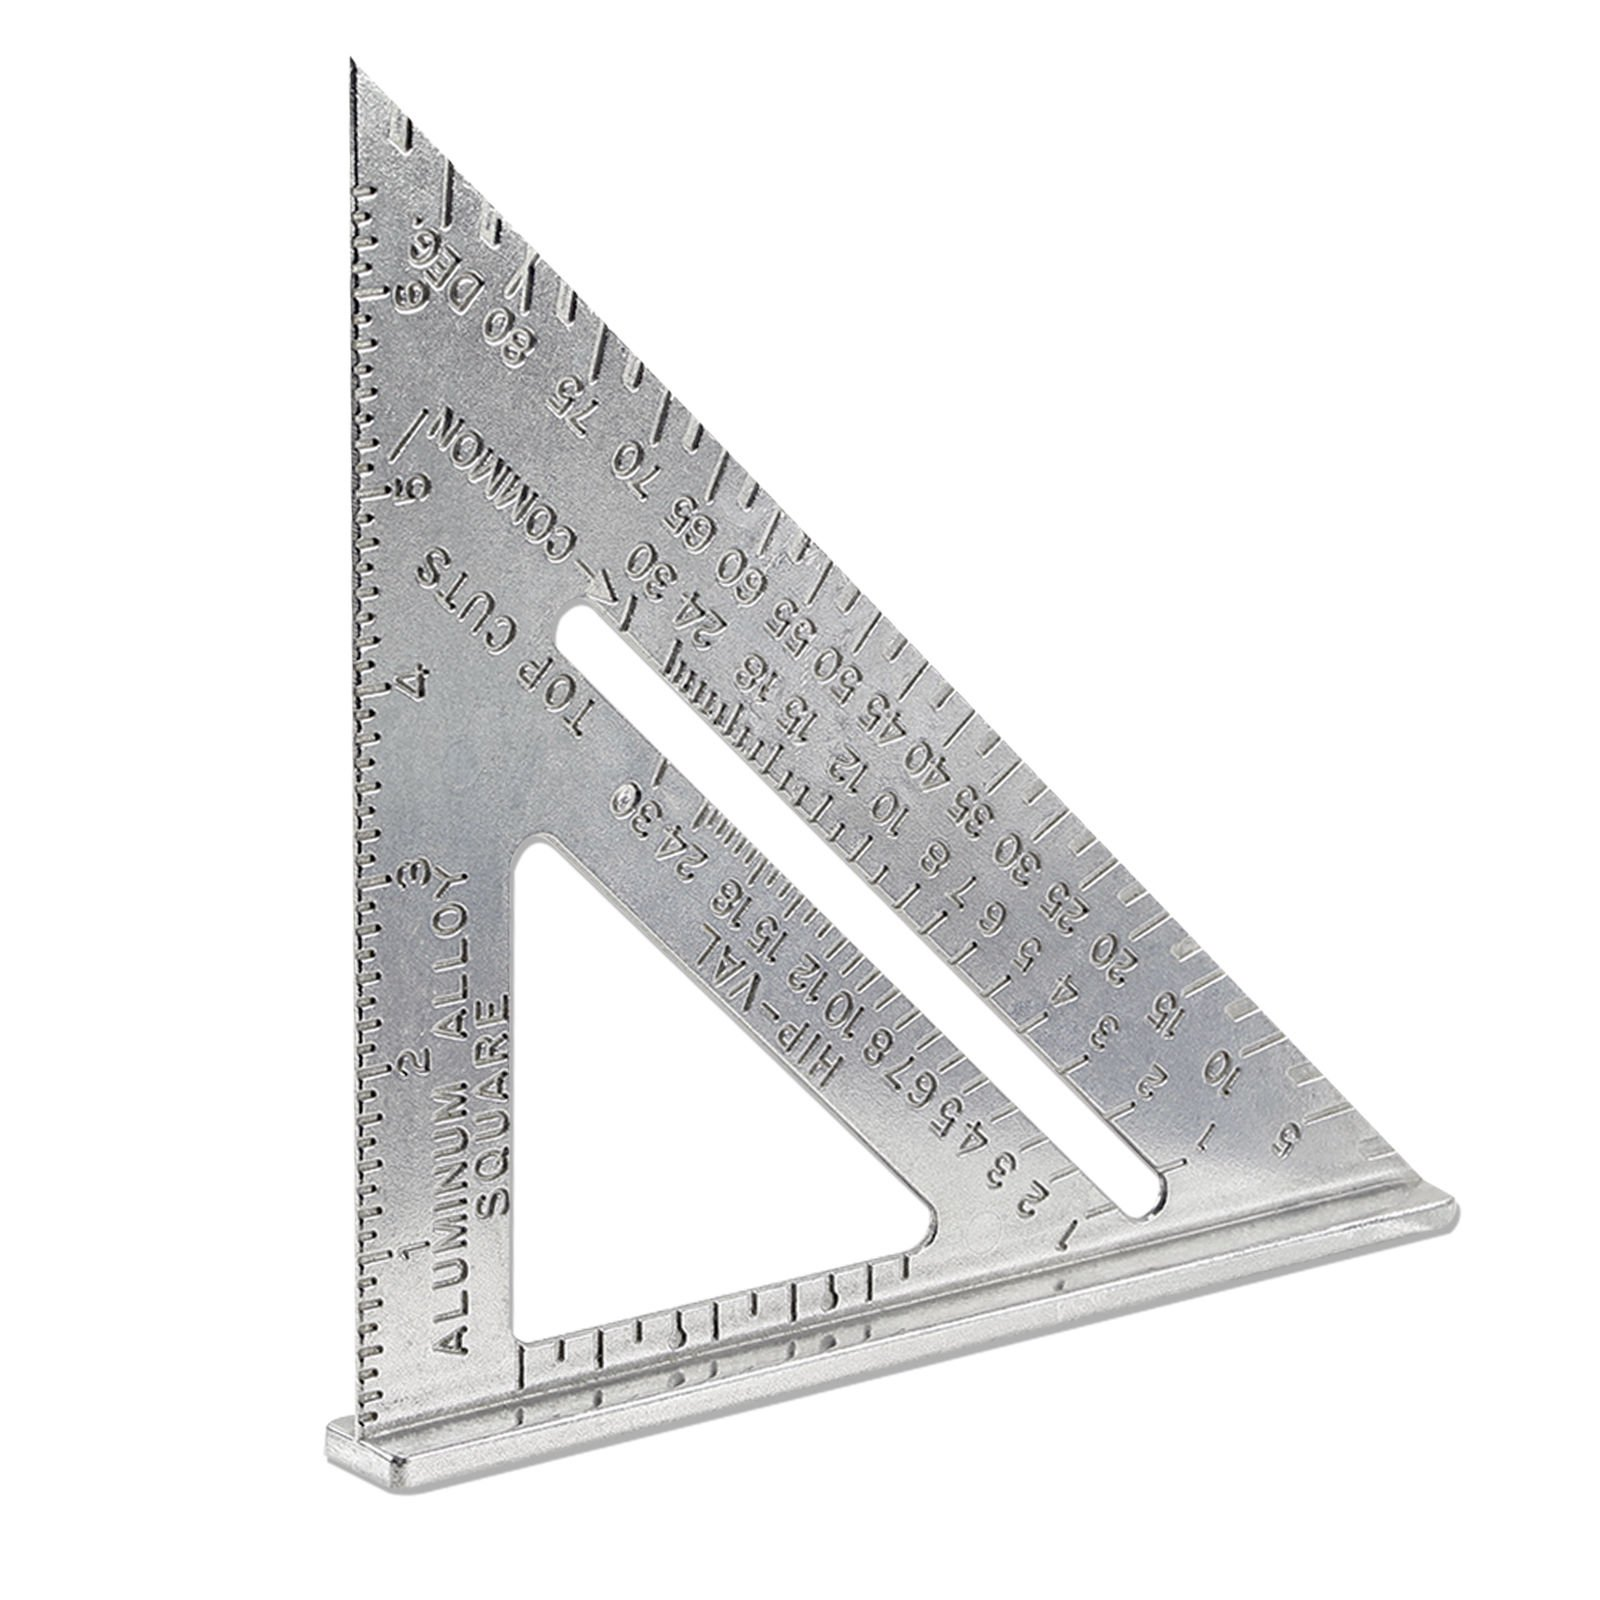 Generic YC-US2-151014-185 <8&21051> Taiwane - SAE Mea Square - SAE 10'' X 7'' Measurements - HD Aluminum Carpenter's Speed Alloy Taiwan 10'' X 7'' Ca